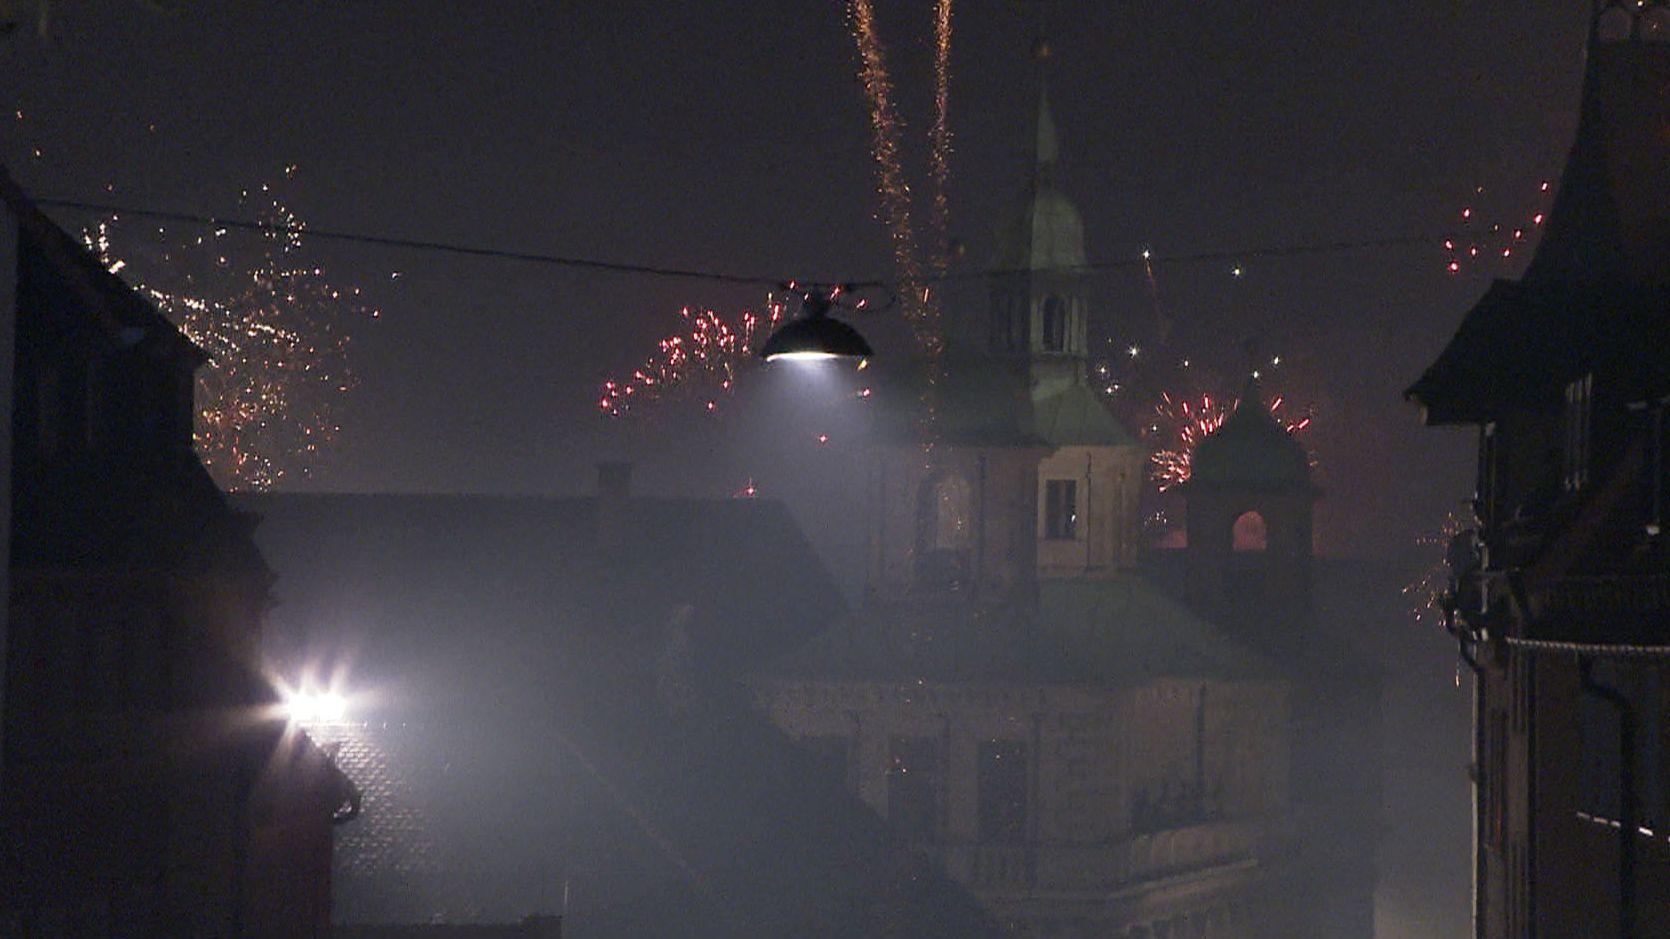 Feuerwerk in der Silvesternacht in Nürnberg